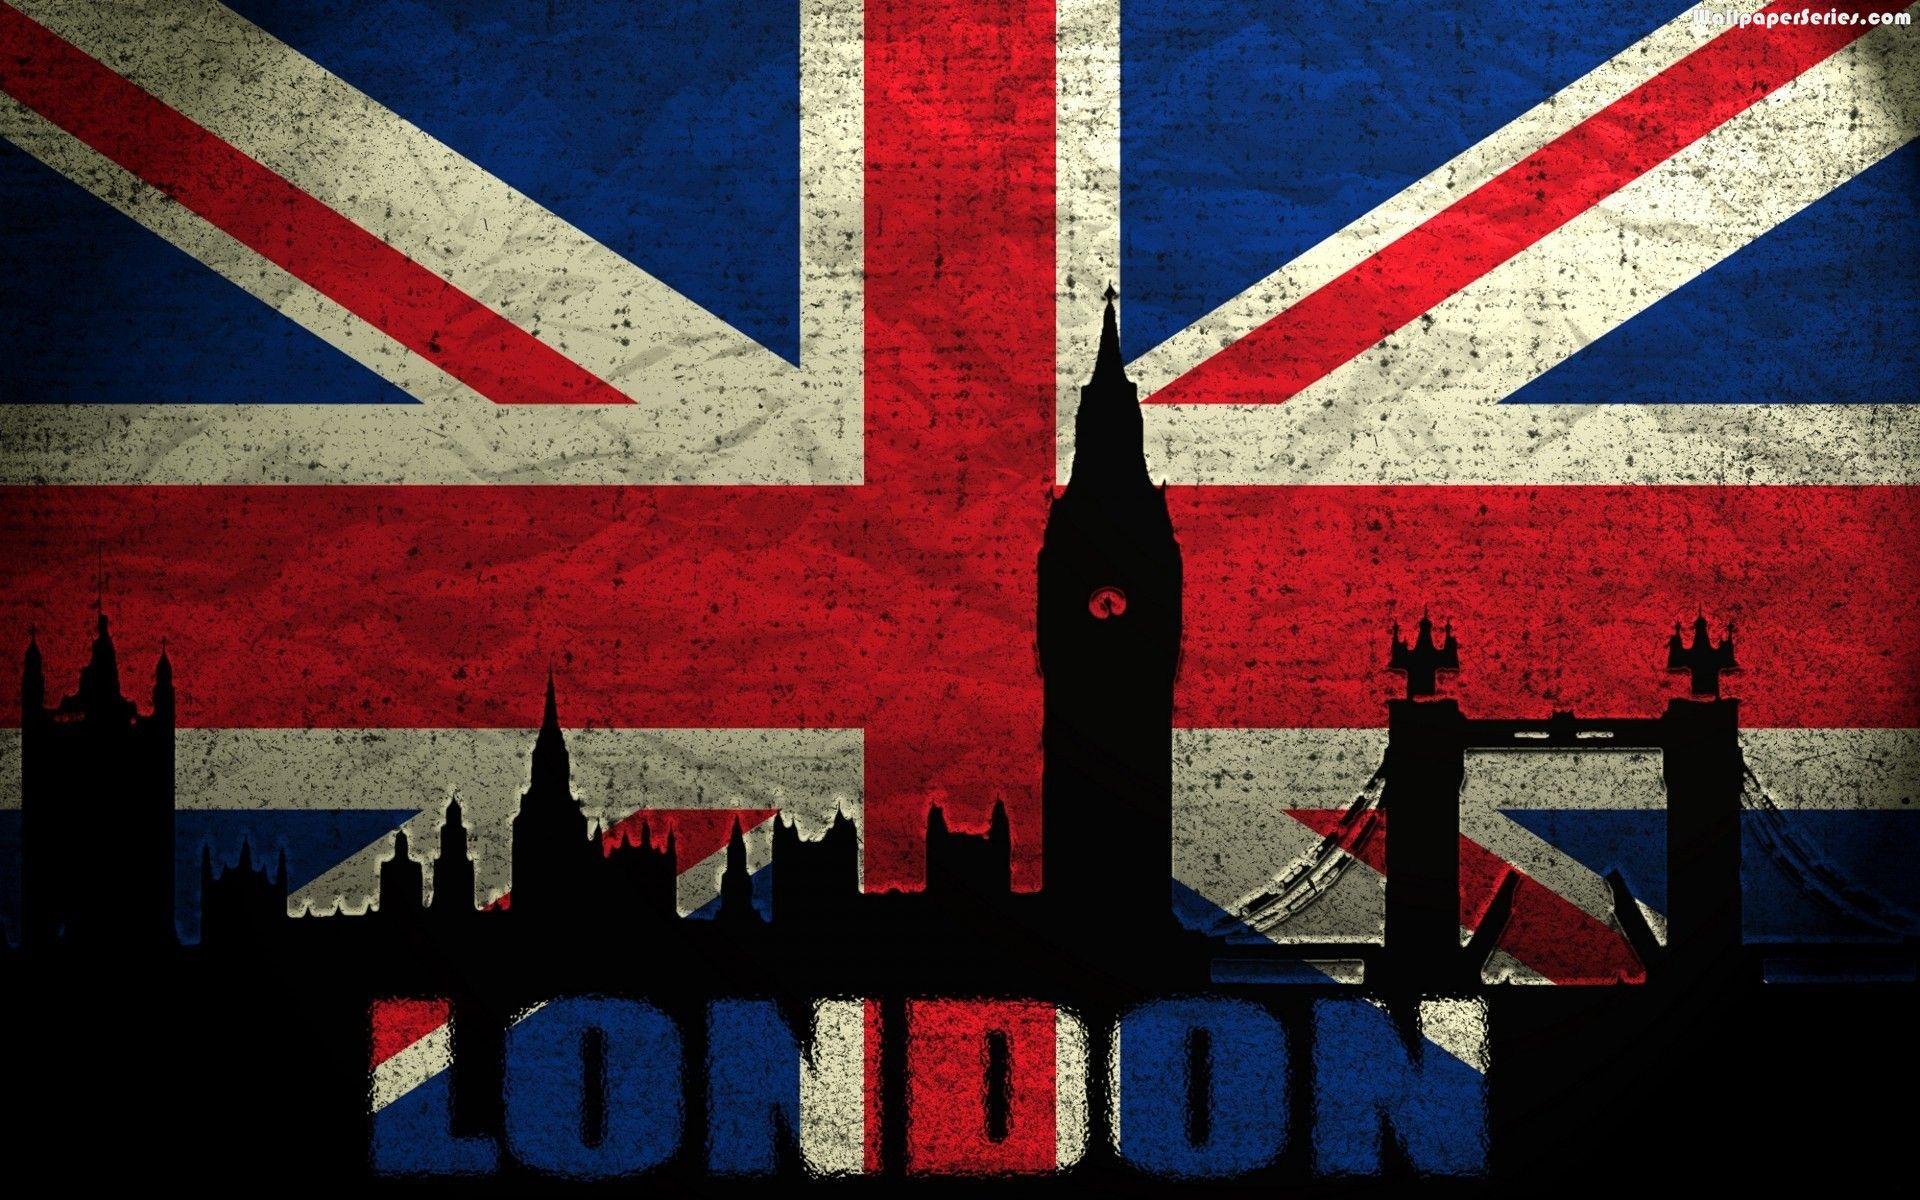 London City Flag Background Wallpaper City Flags Flag Background London City